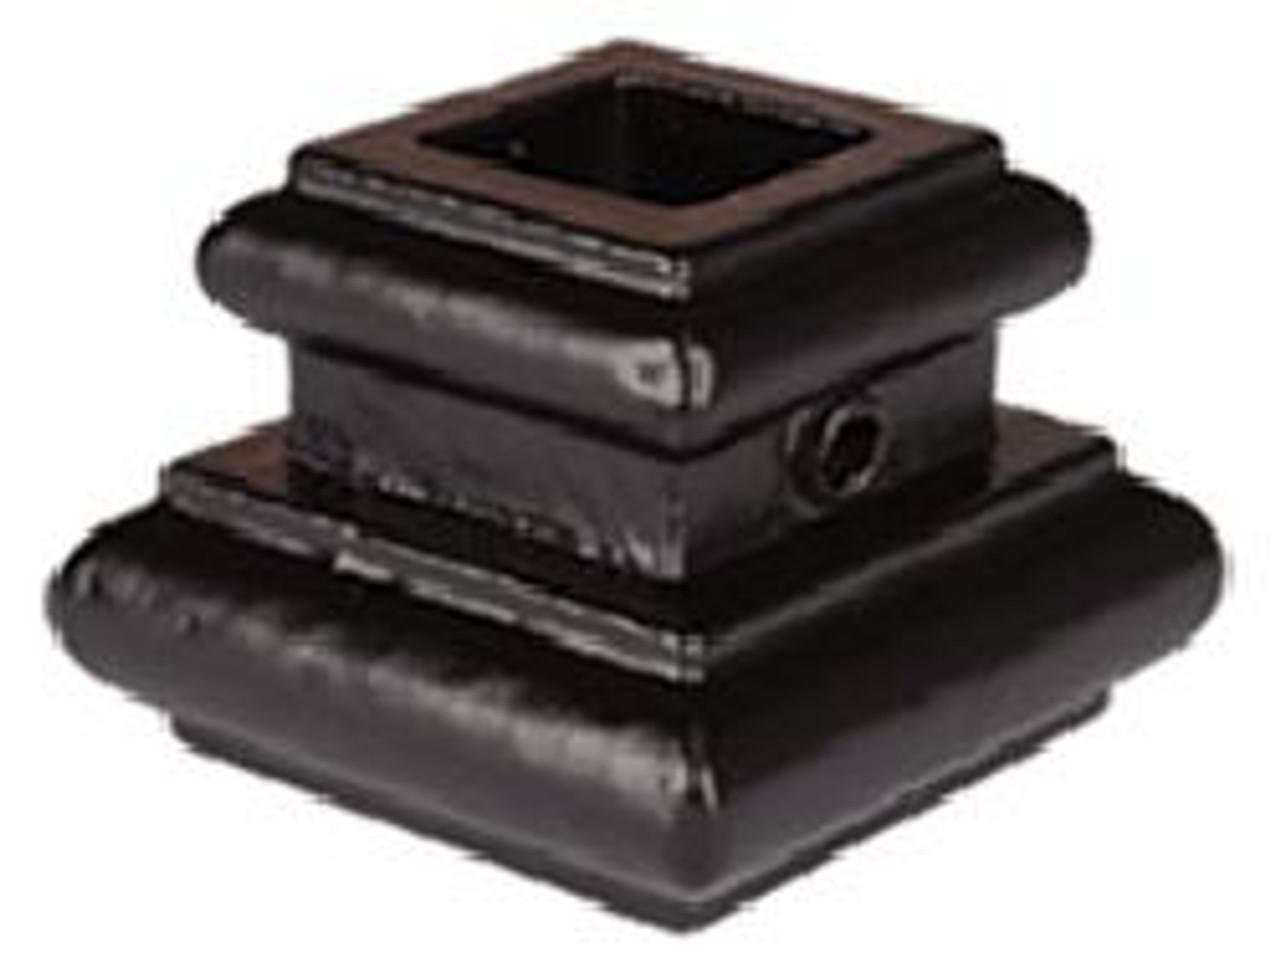 "HF16.3.29 1/2"" Flat Shoe, Oil Rubbed Bronze"